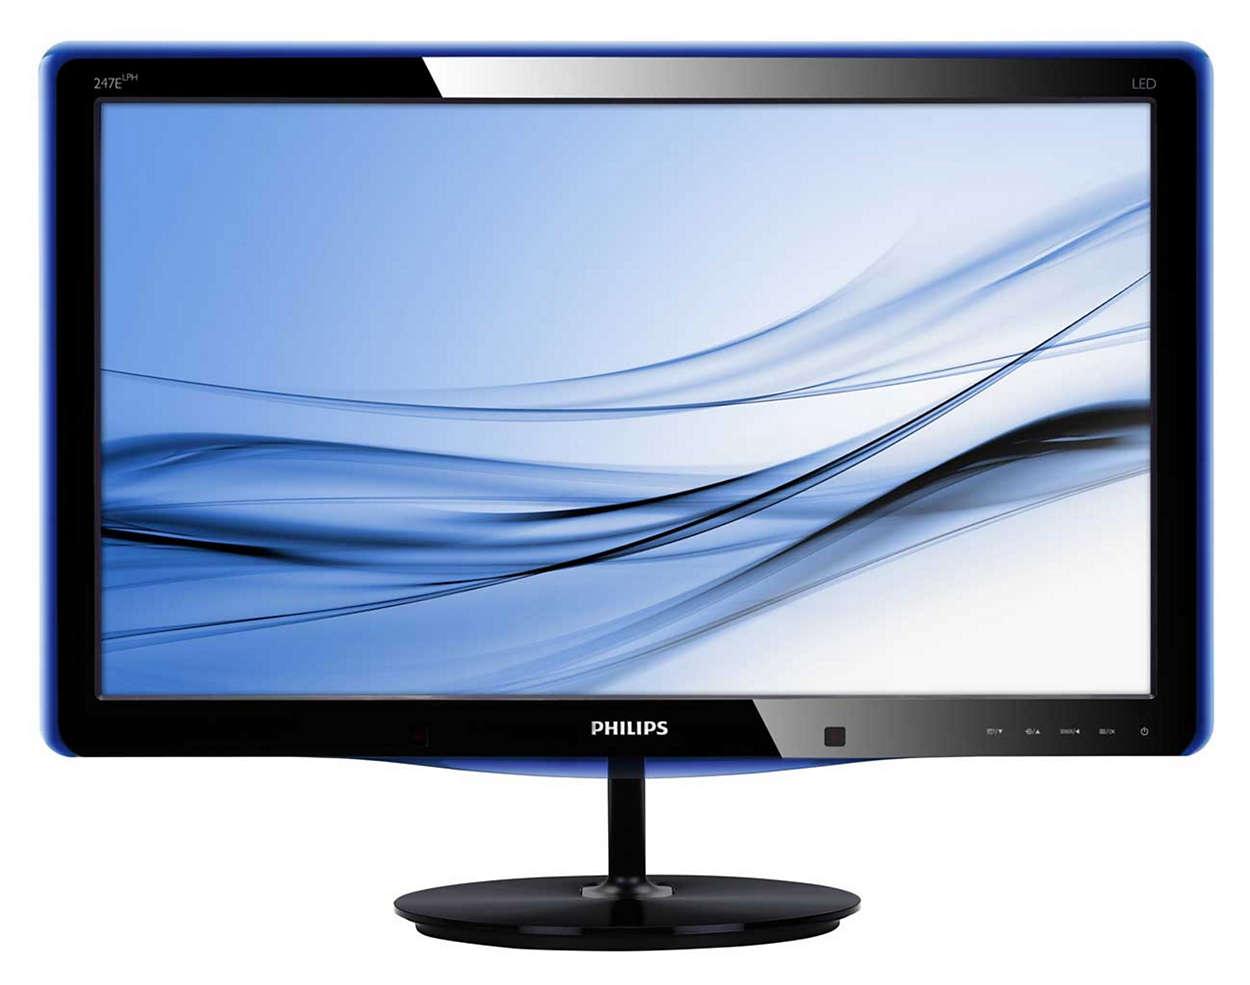 Elegant display with PowerSensor